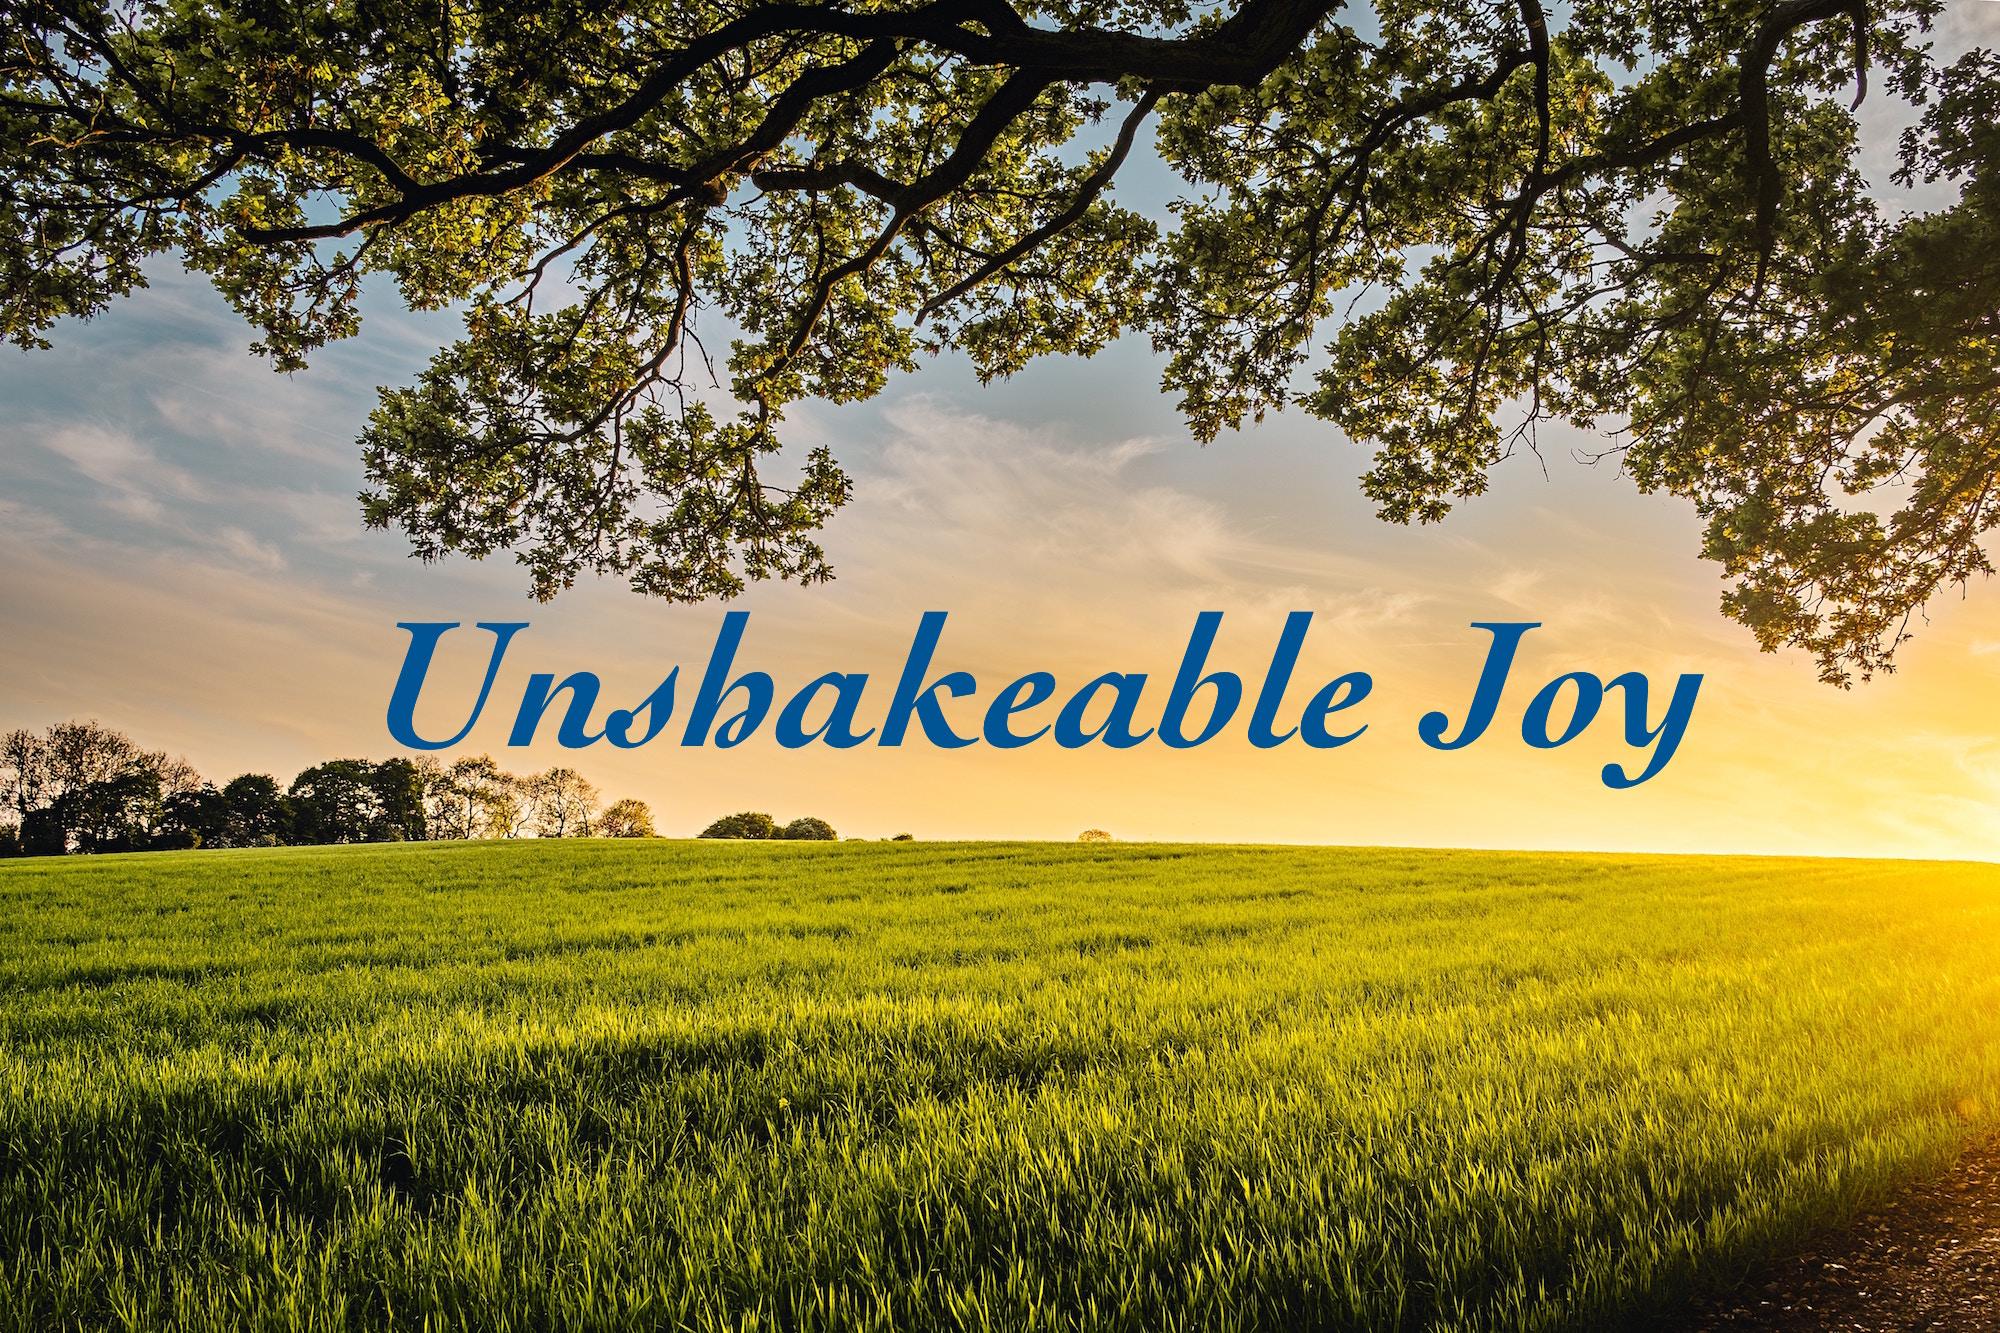 Unshakeable Joy 1.jpeg